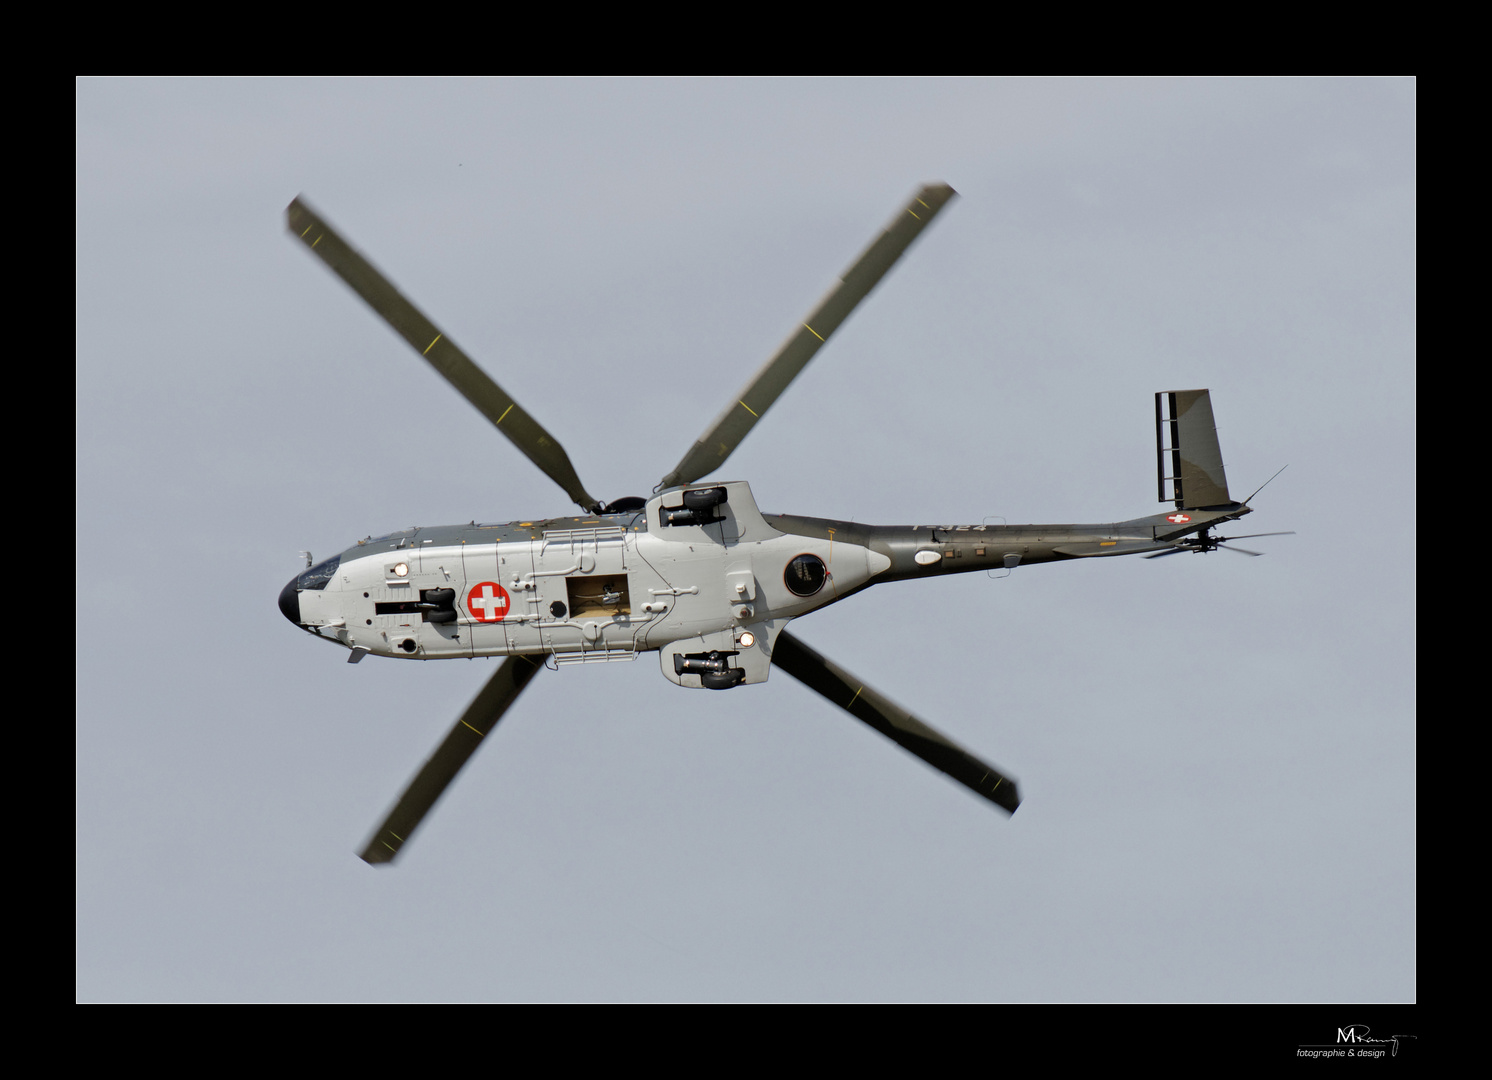 Eurocopter As 332 M1 Super Puma